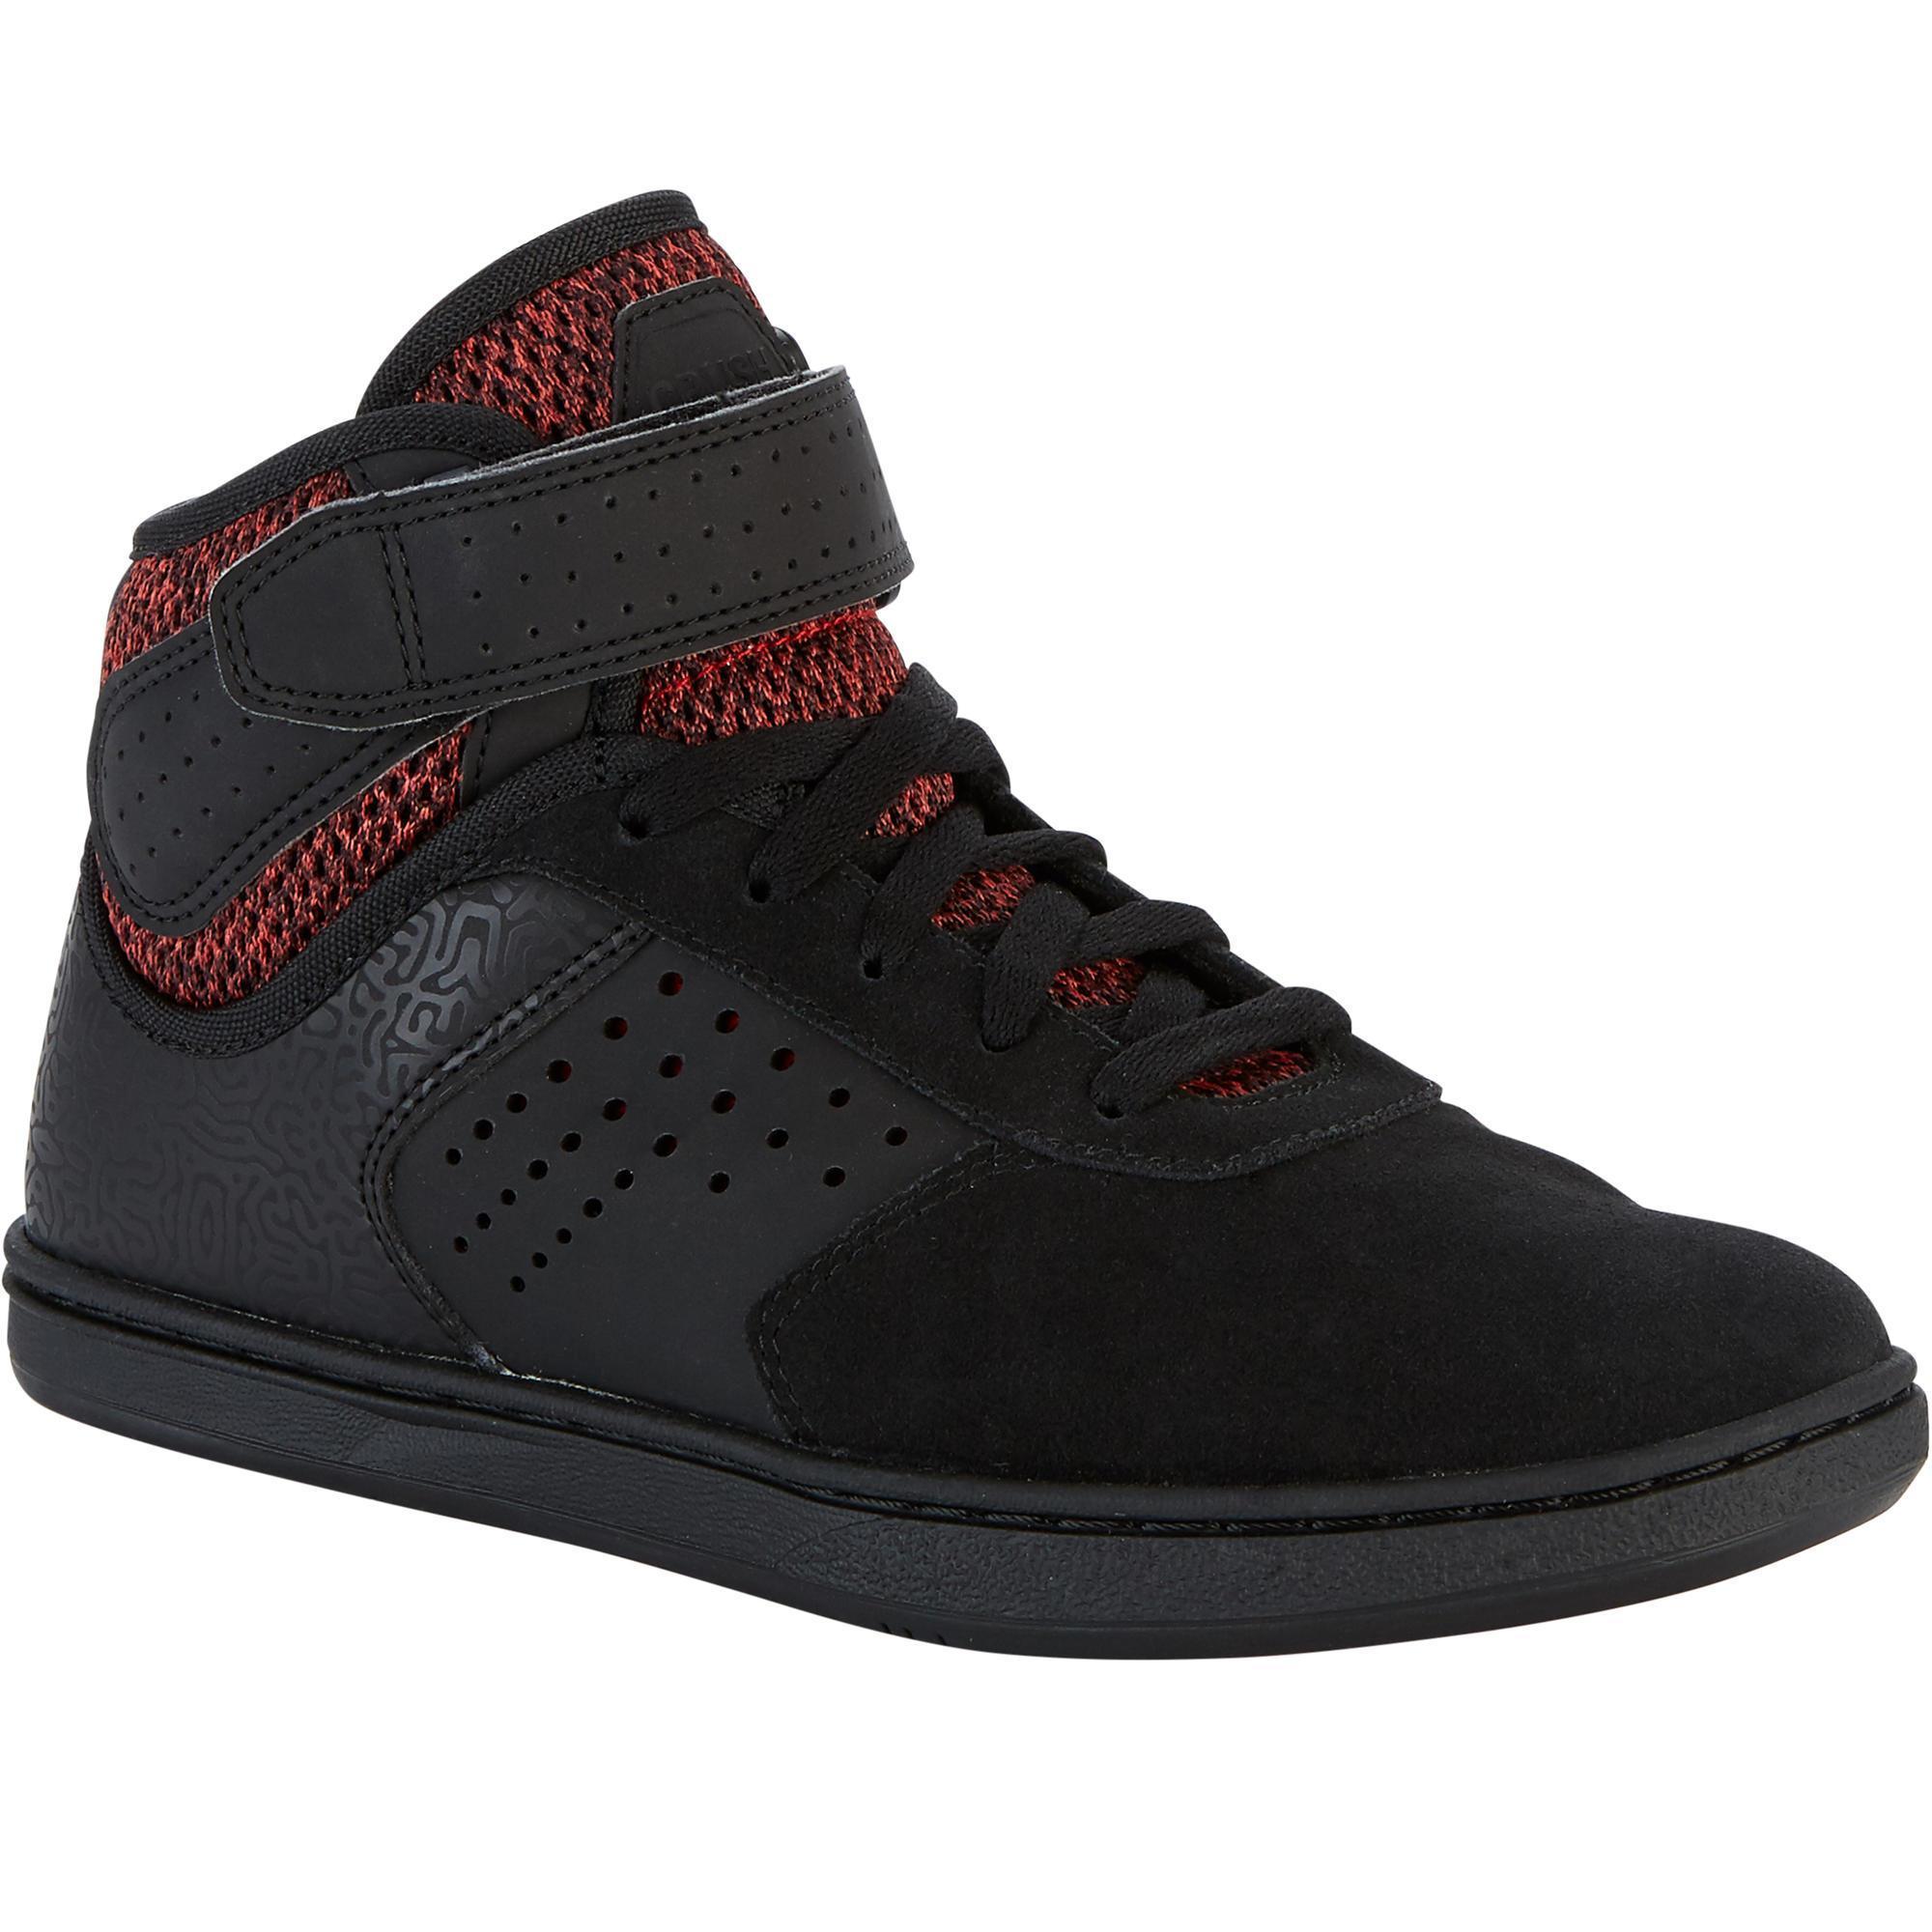 sports shoes 2381f e0ace Skateschuhe | günstig | Oxelo | DECATHLON l